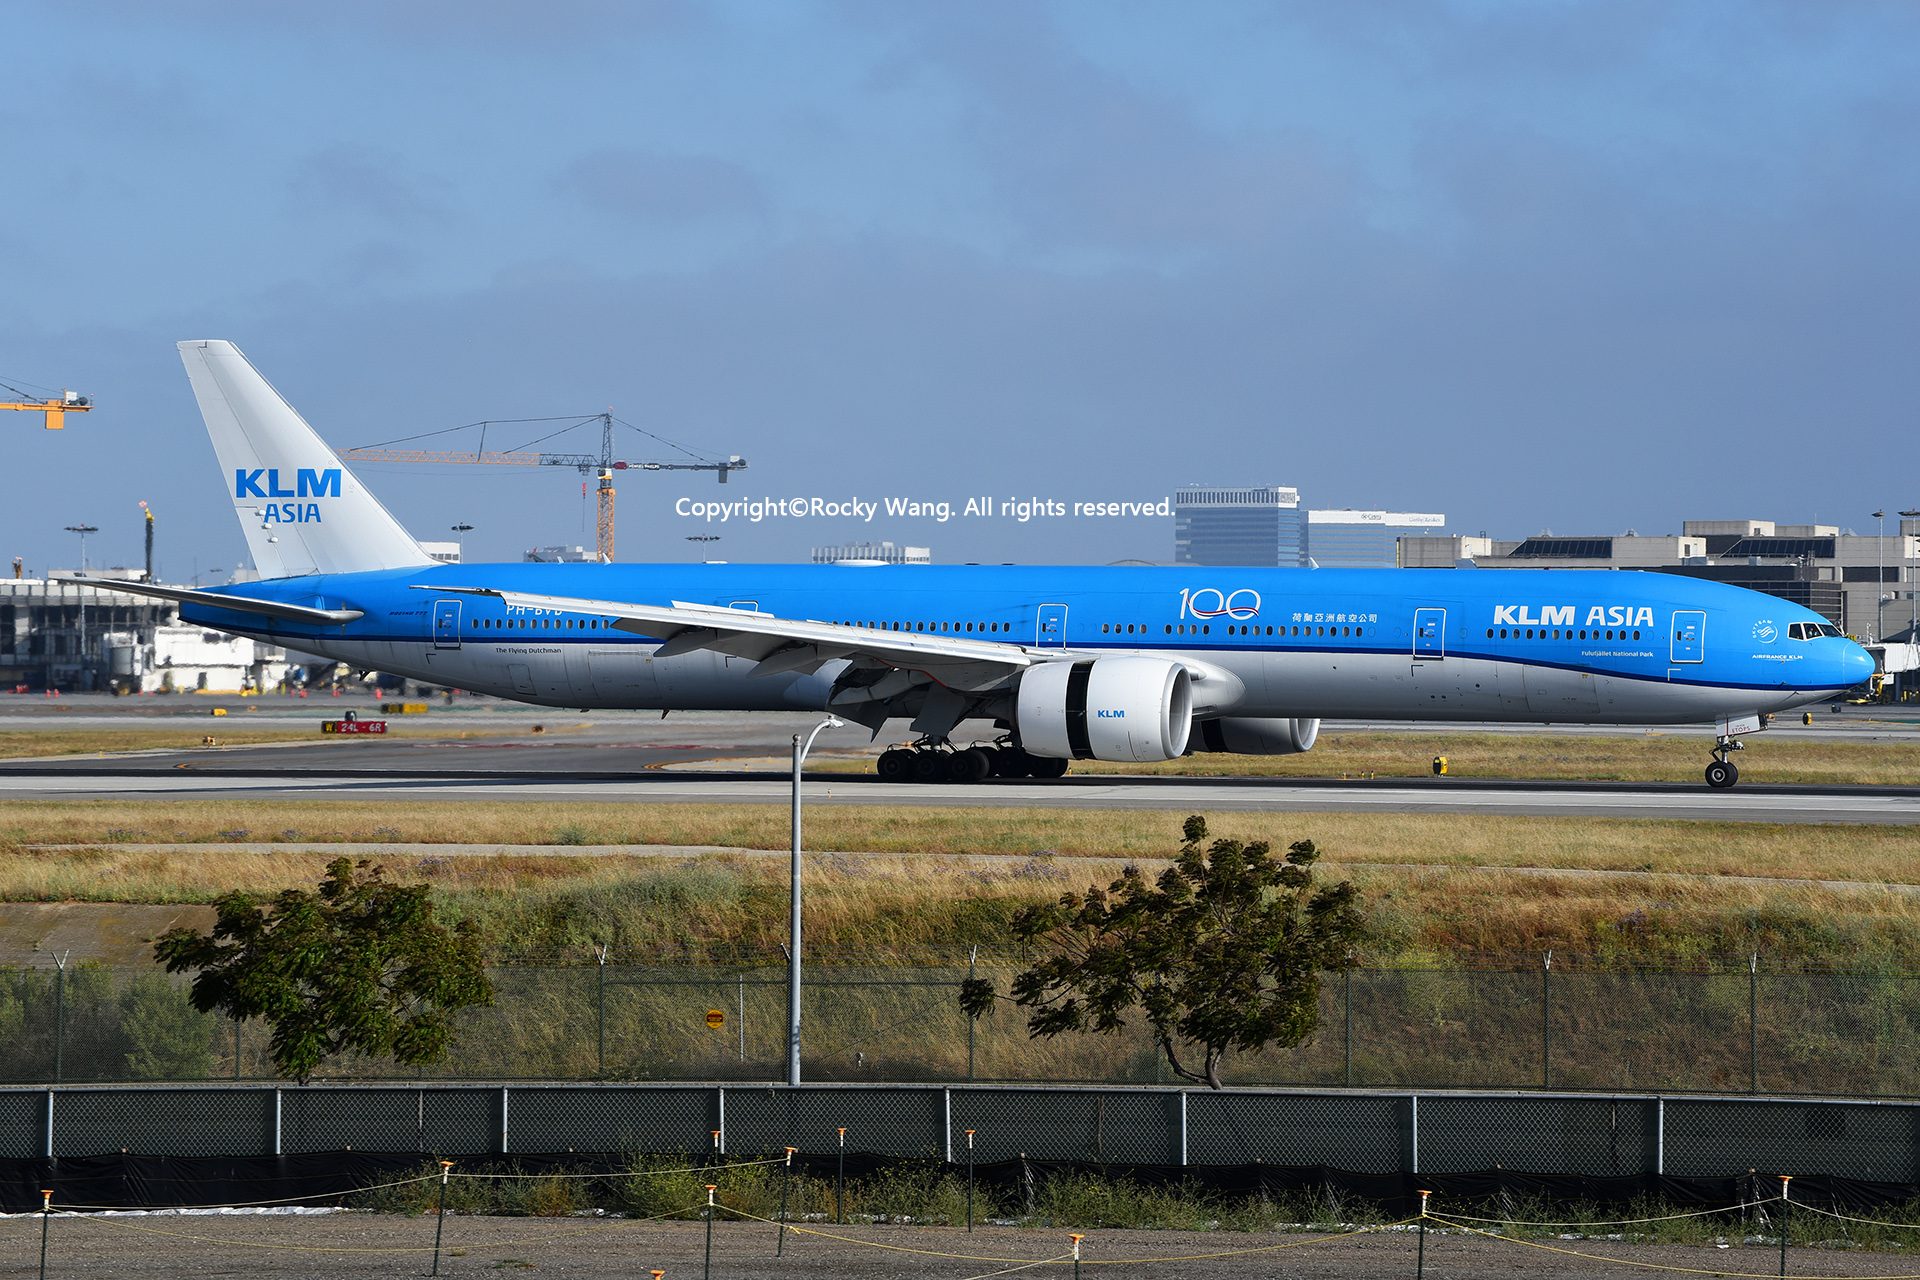 Re:[原创]LAX-暖冬与残夏 BOEING 777-306ER PH-BVB Los Angeles Int'l Airport